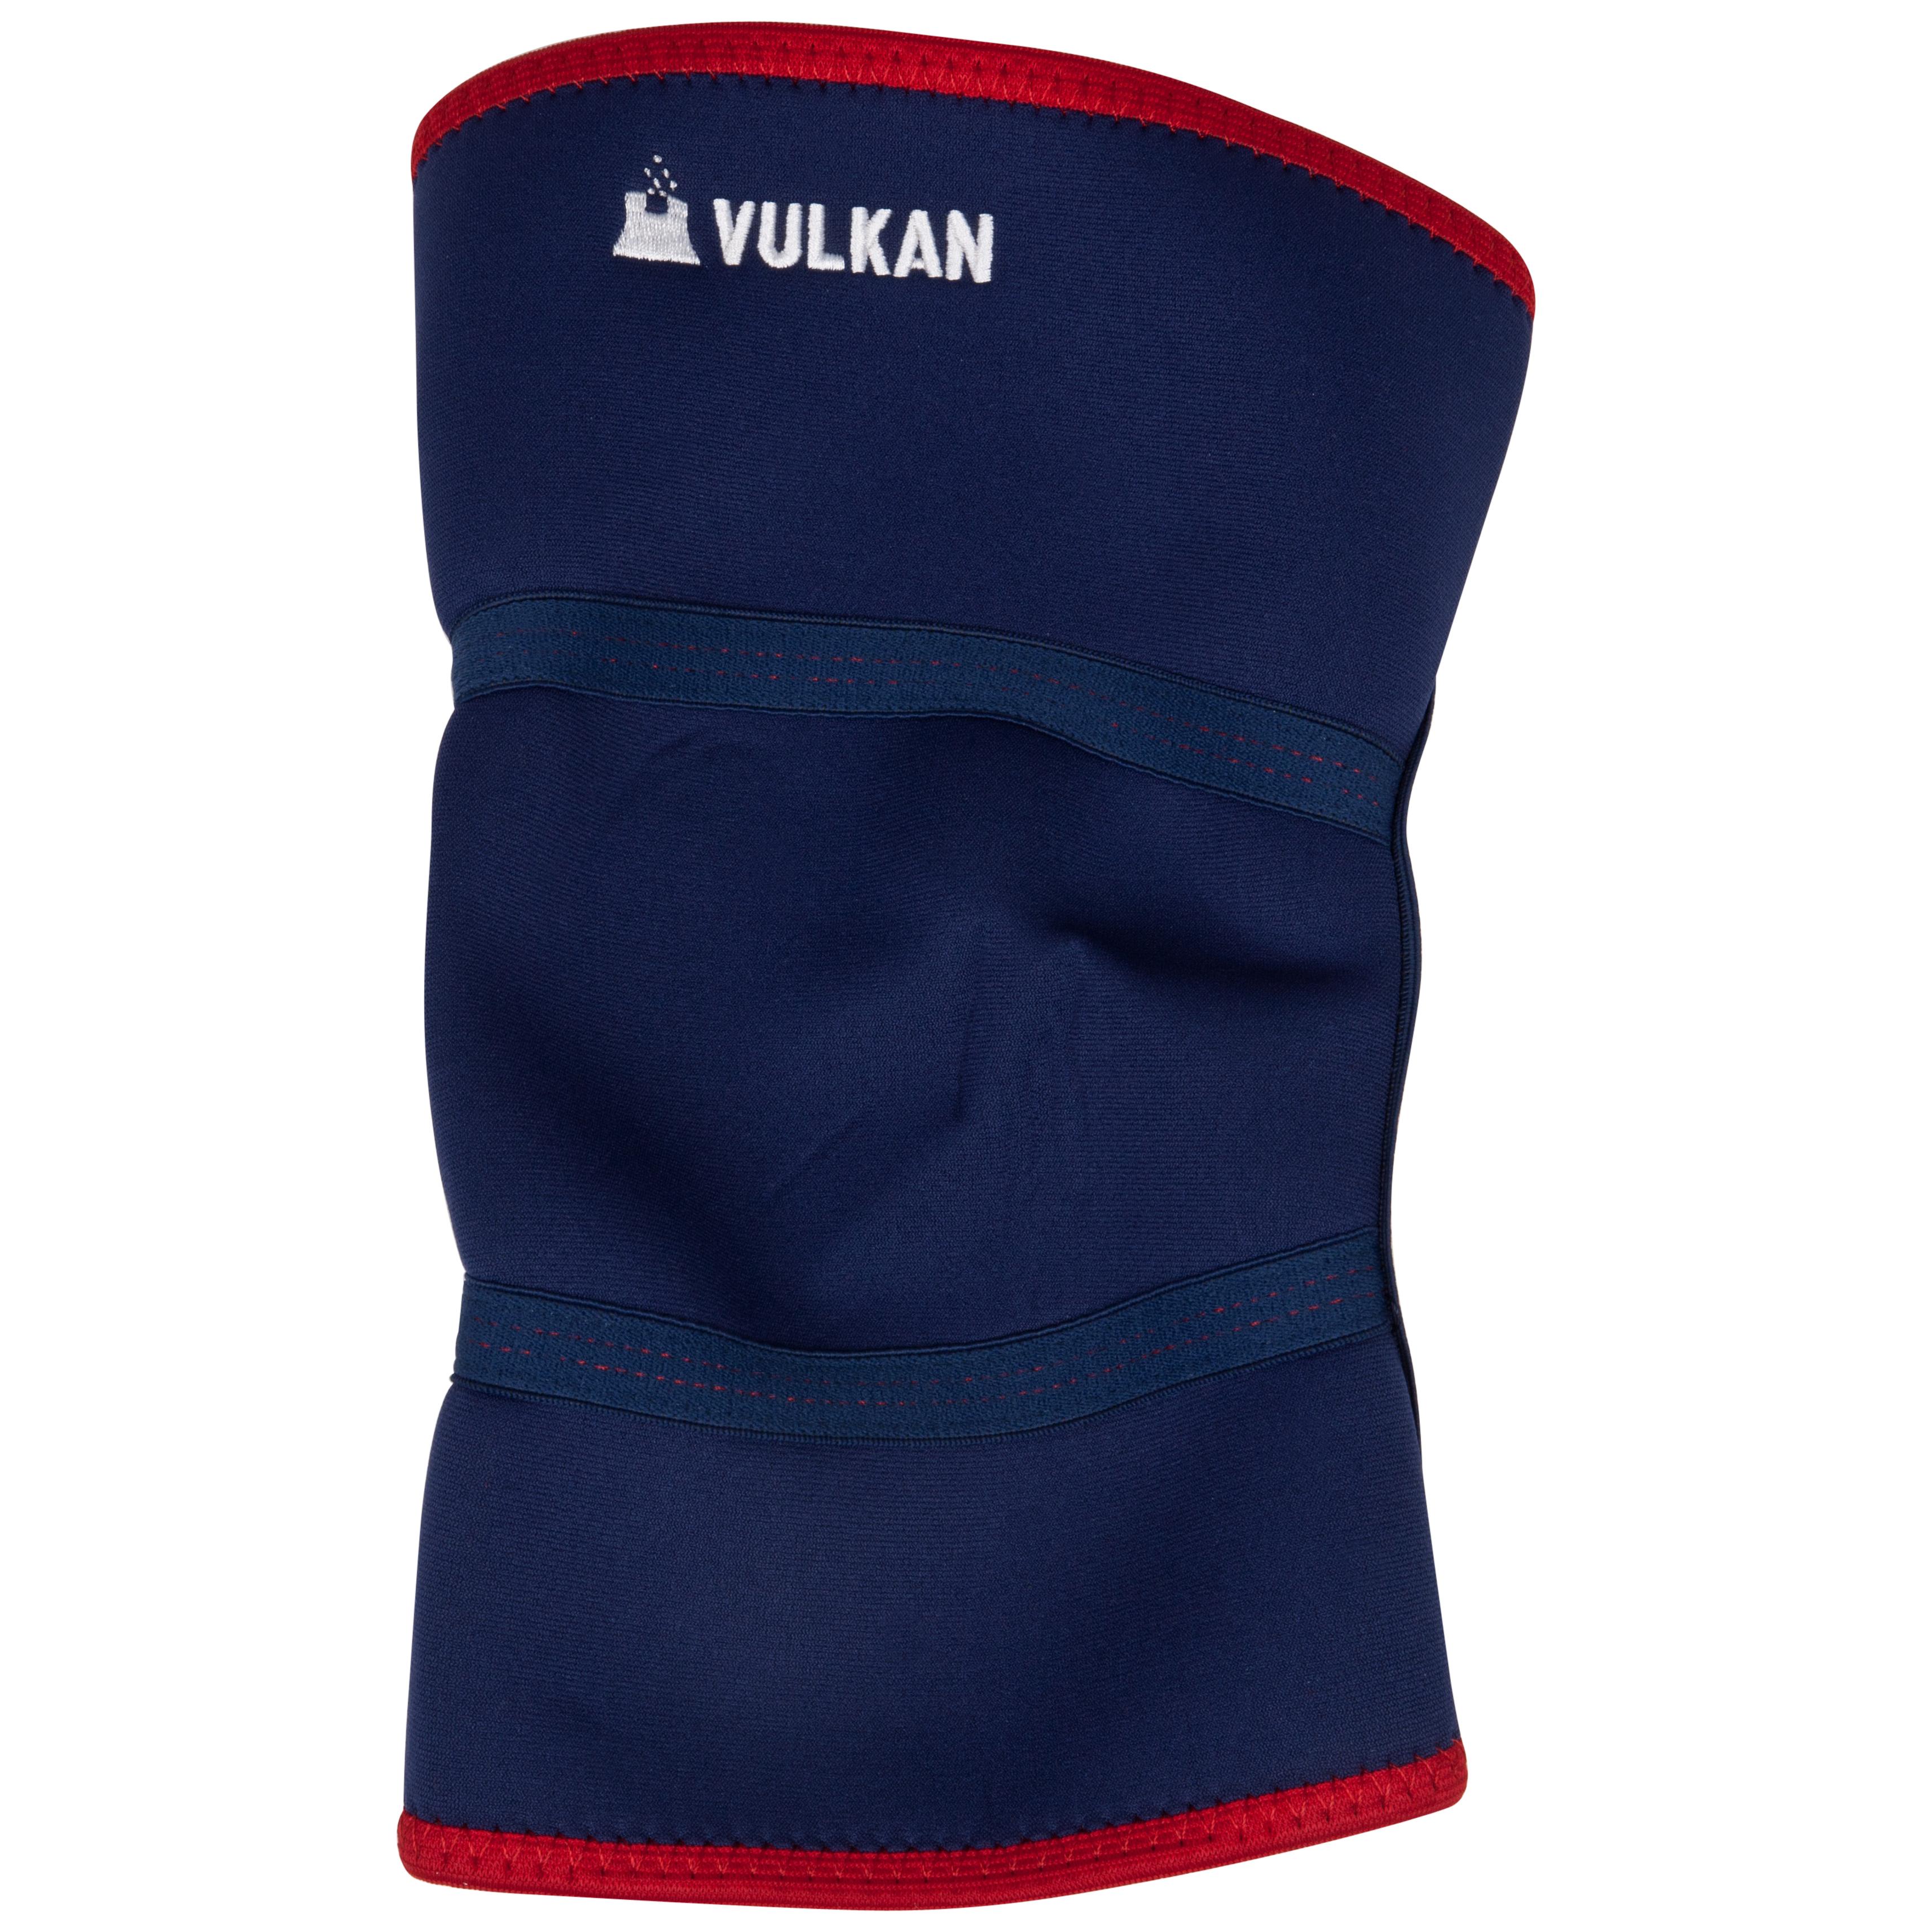 Vulkan 3mm Knee Support - Blue/Red